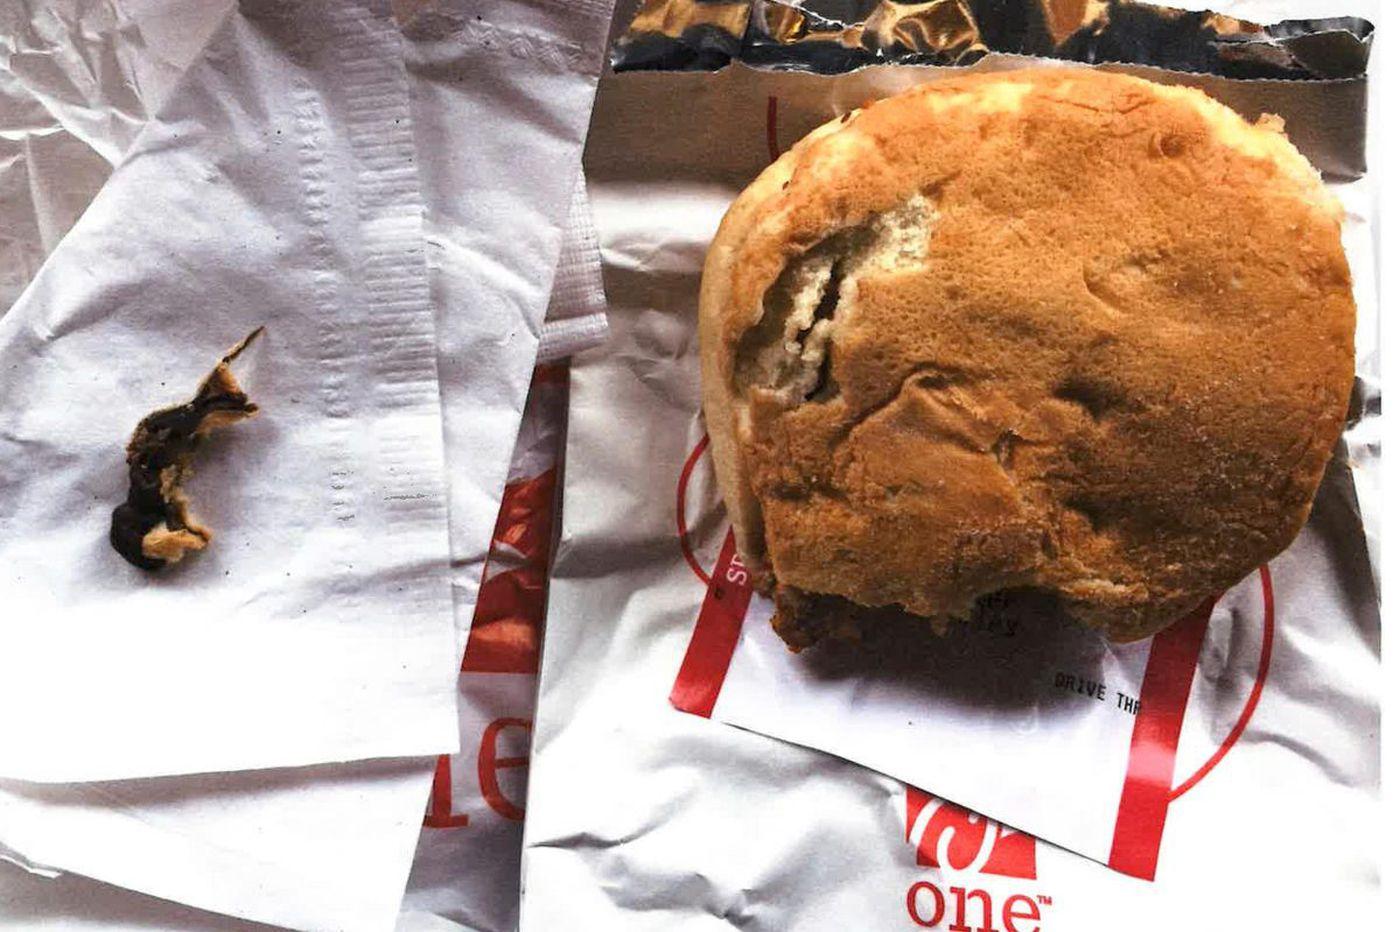 Bucks woman: Dead rodent baked into my Chick-fil-A sandwich